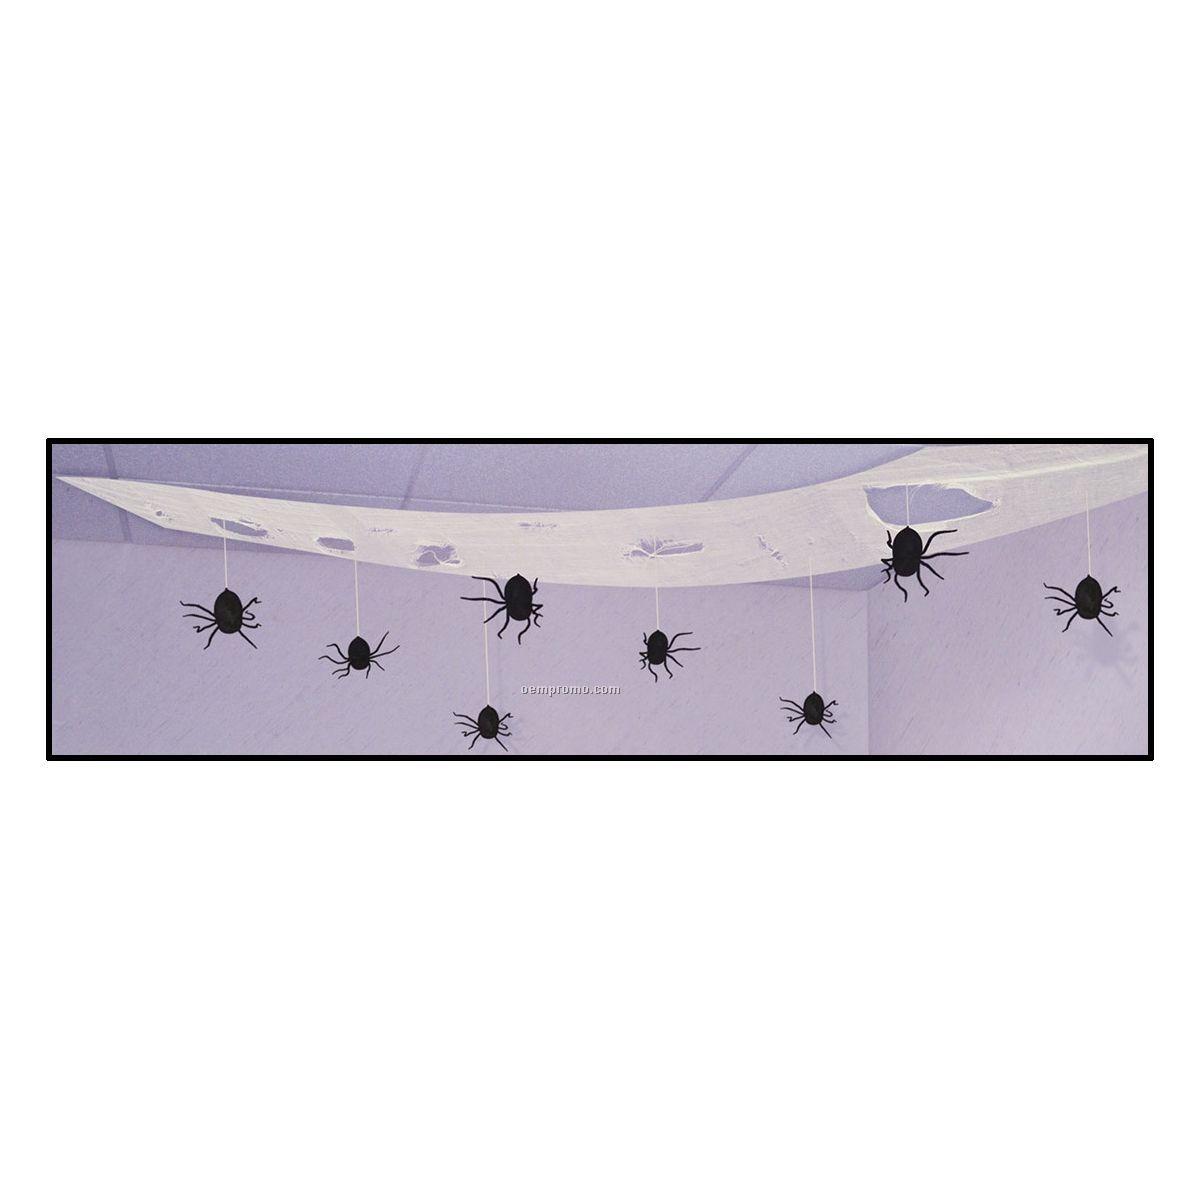 Spooky Spider Ceiling Drape